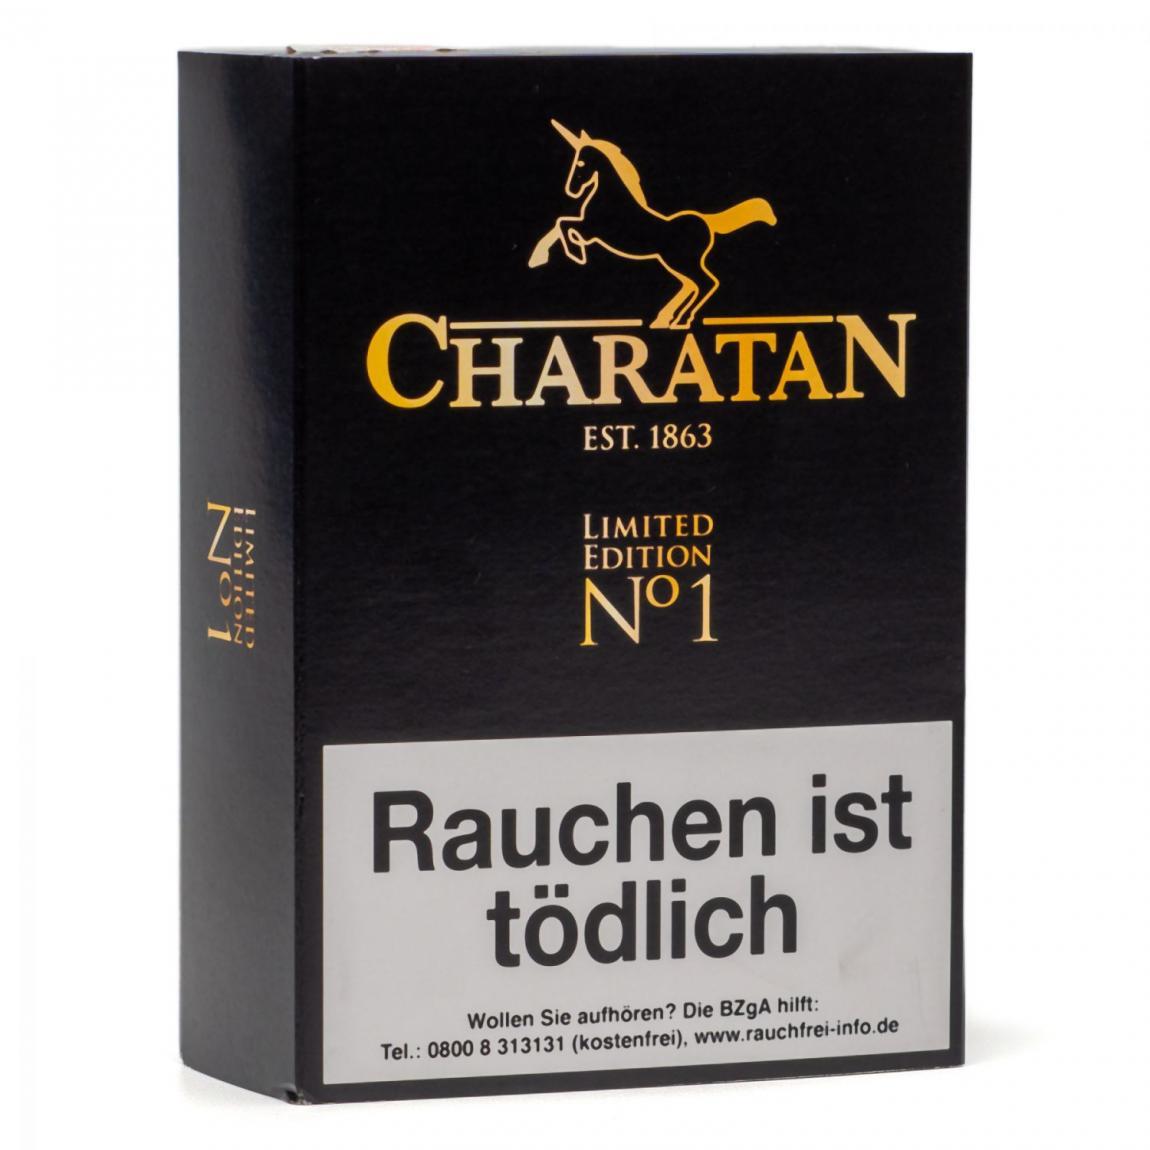 Charatan No 1 Limited Edition